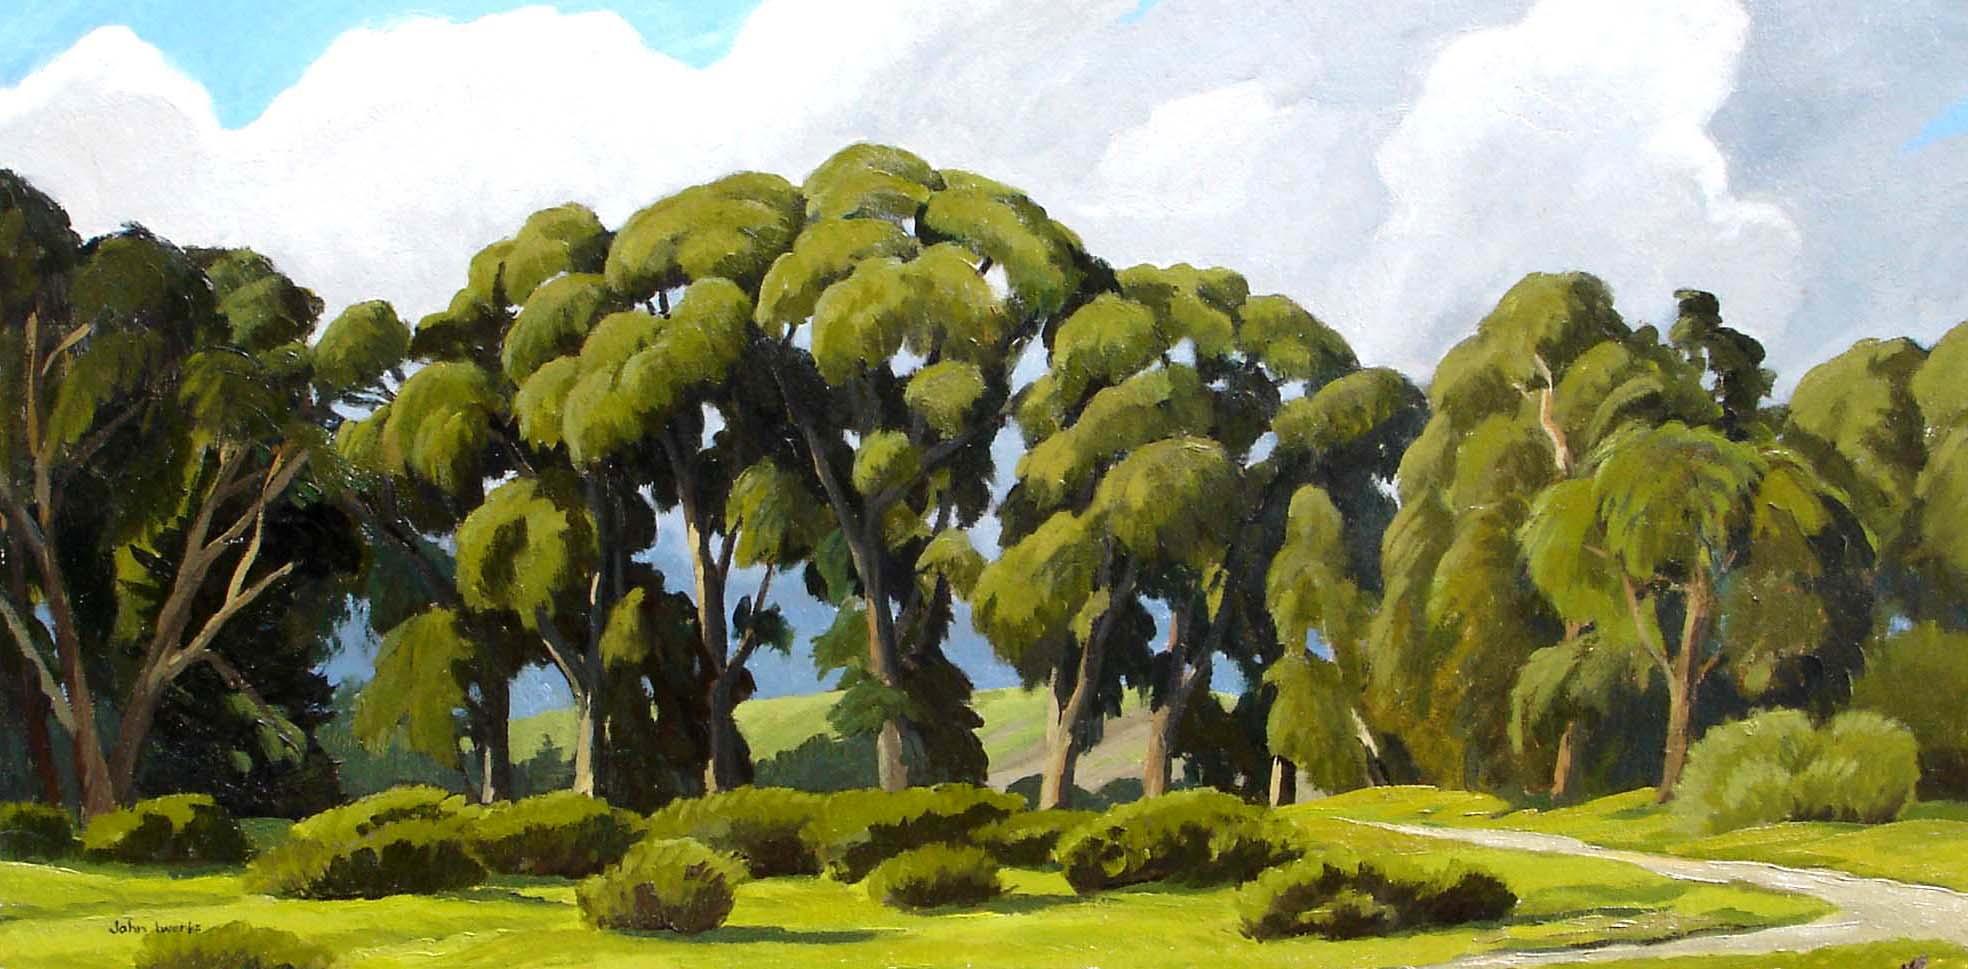 Wilcox Eucalyptus, oil, John Iwerks